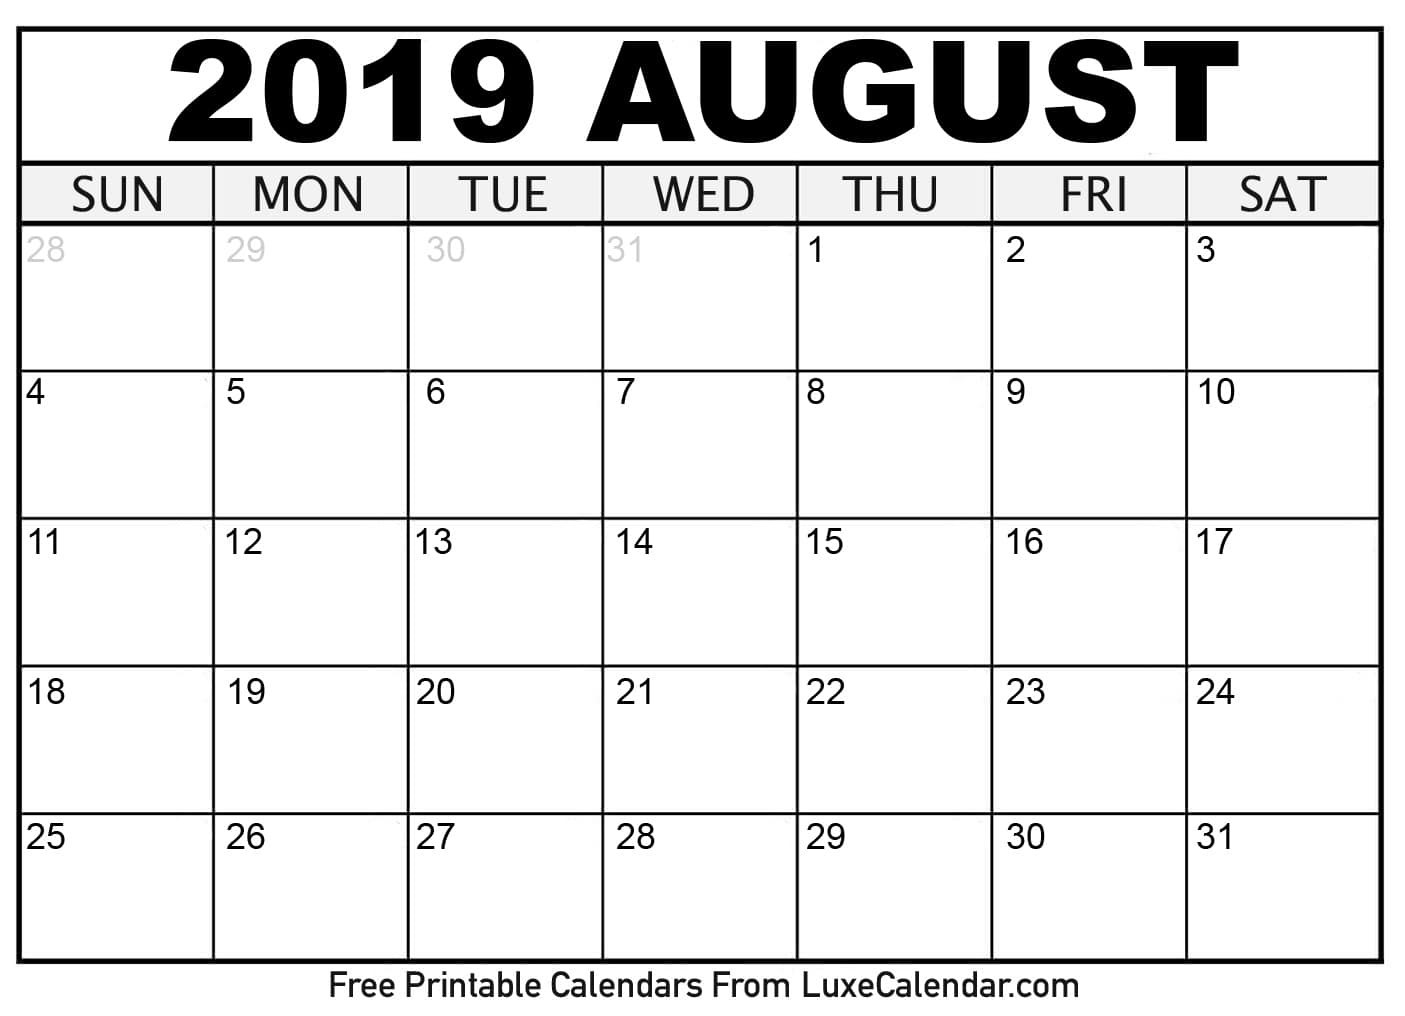 Blank August 2019 Printable Calendar Luxe Calendar